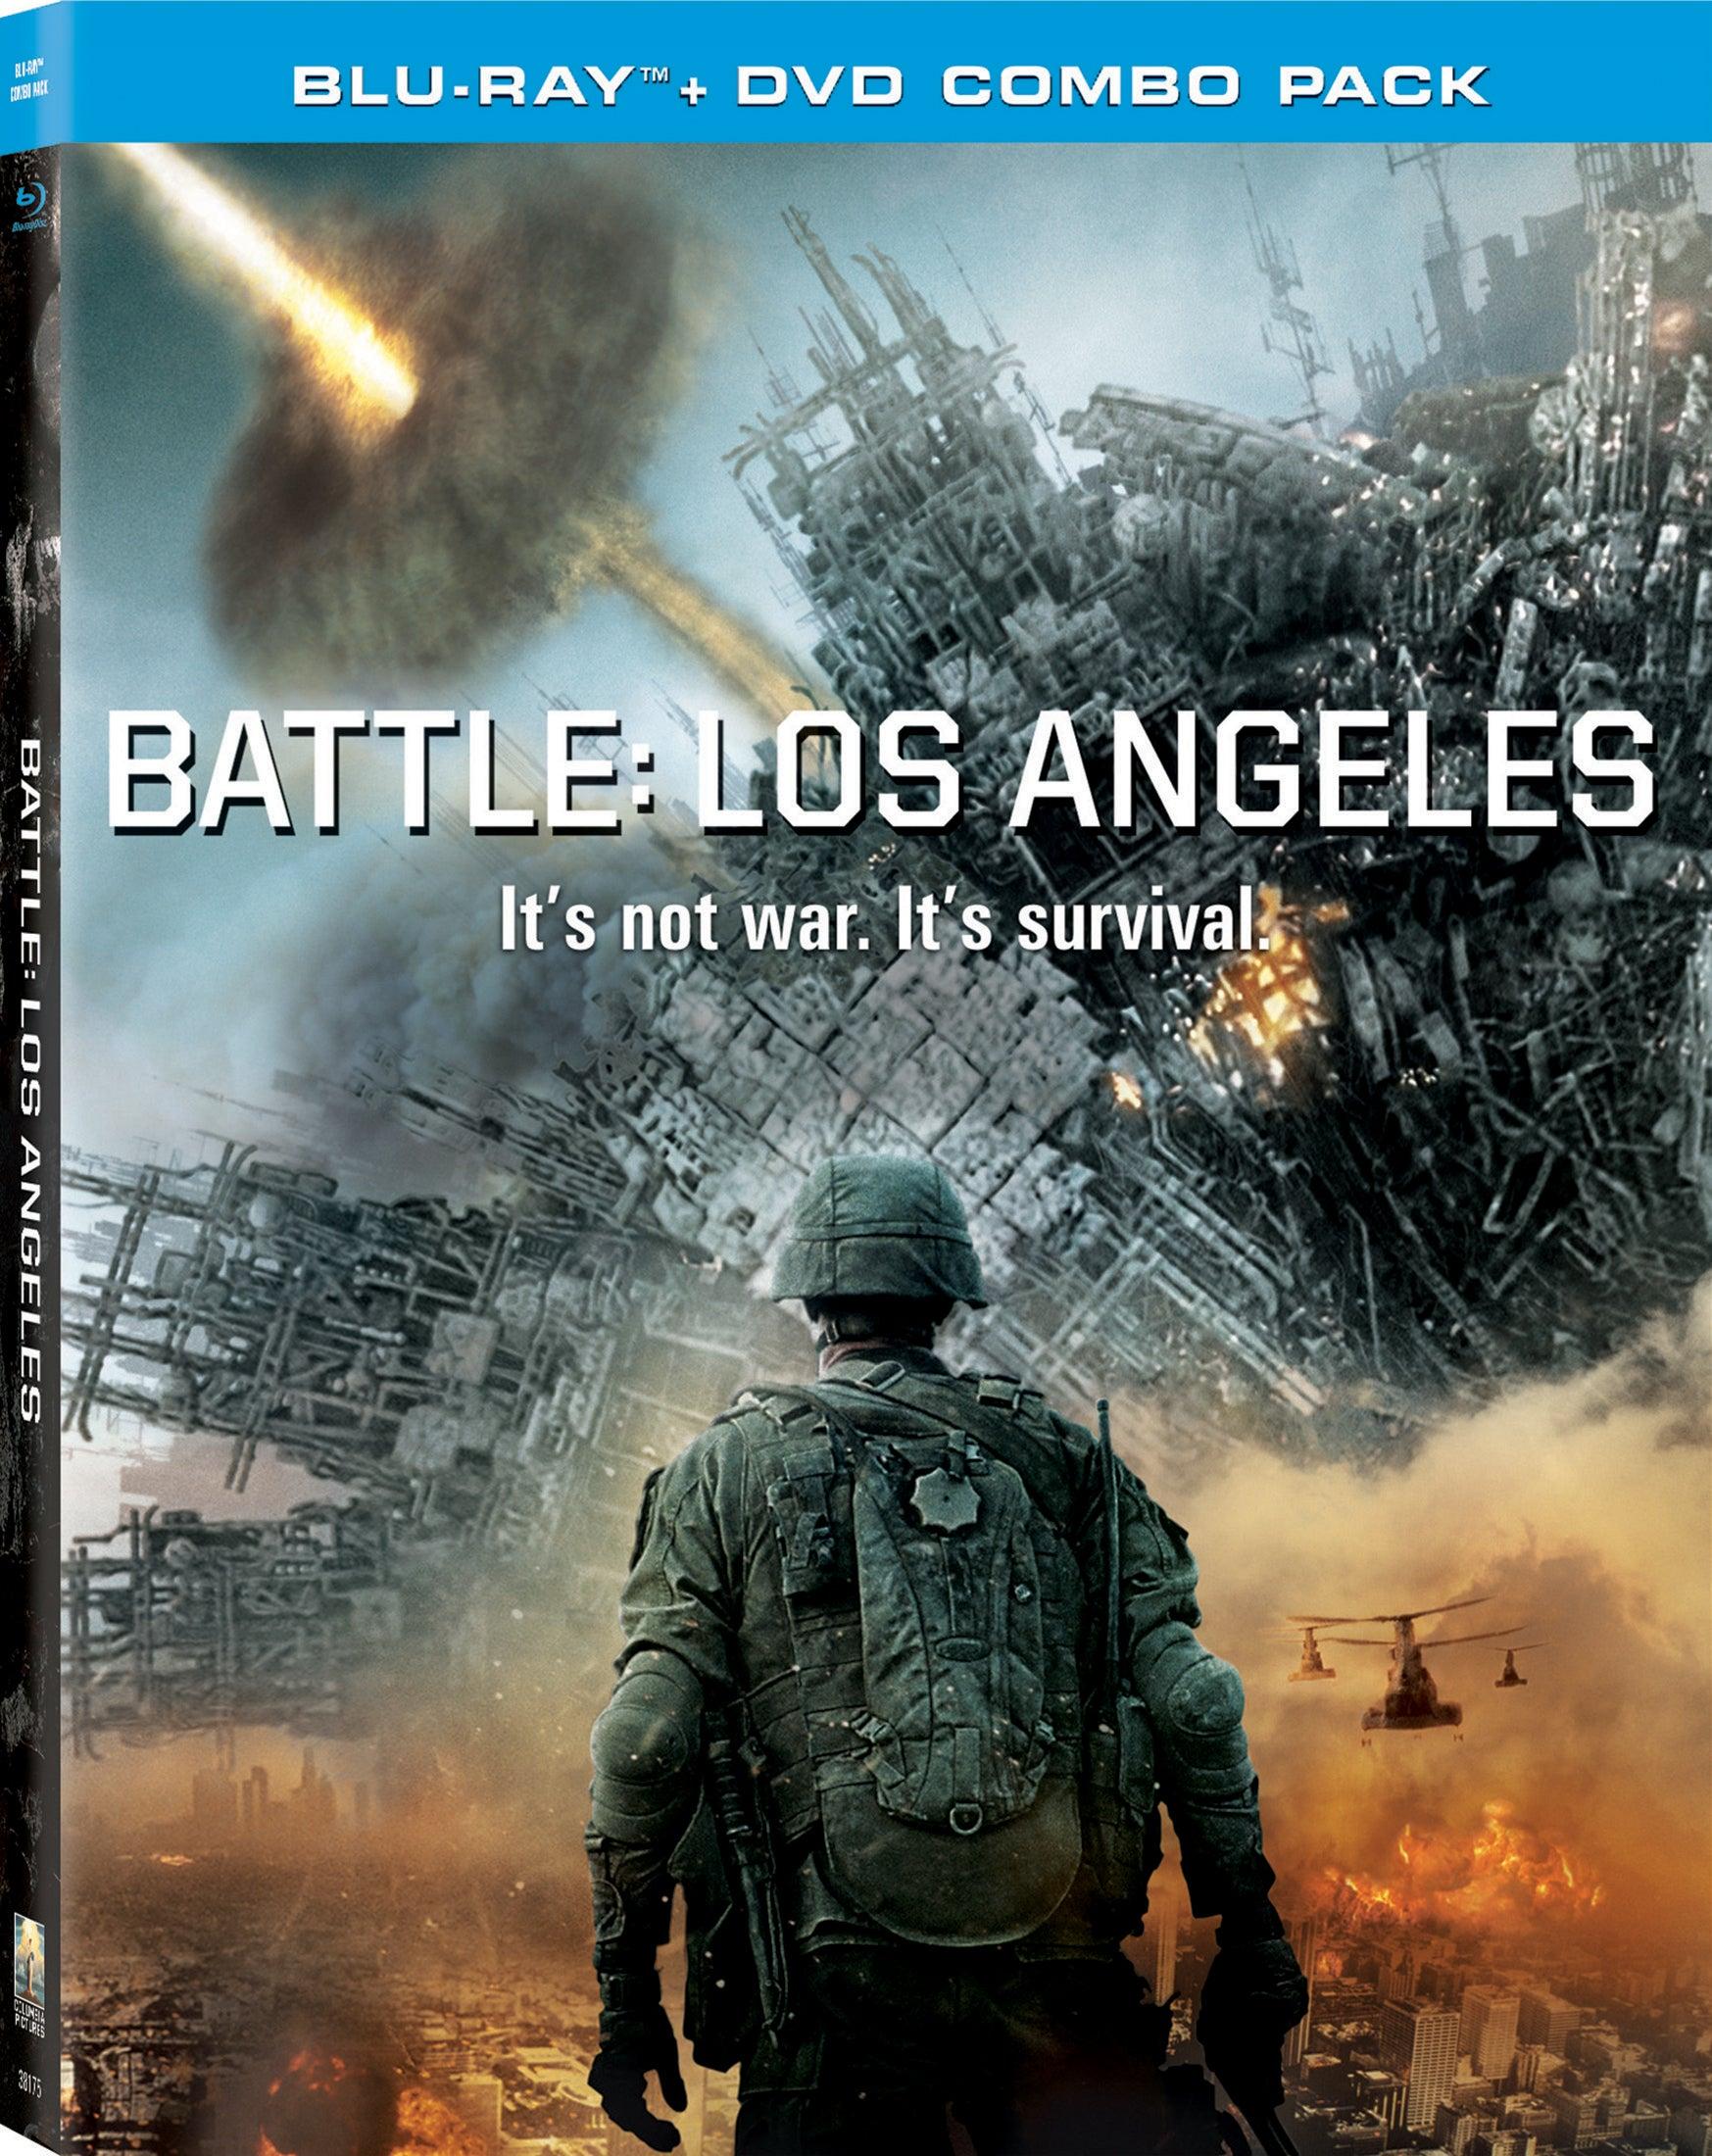 Battle: Los Angeles (Bluray/DVD Combo) (Blu-ray/DVD)